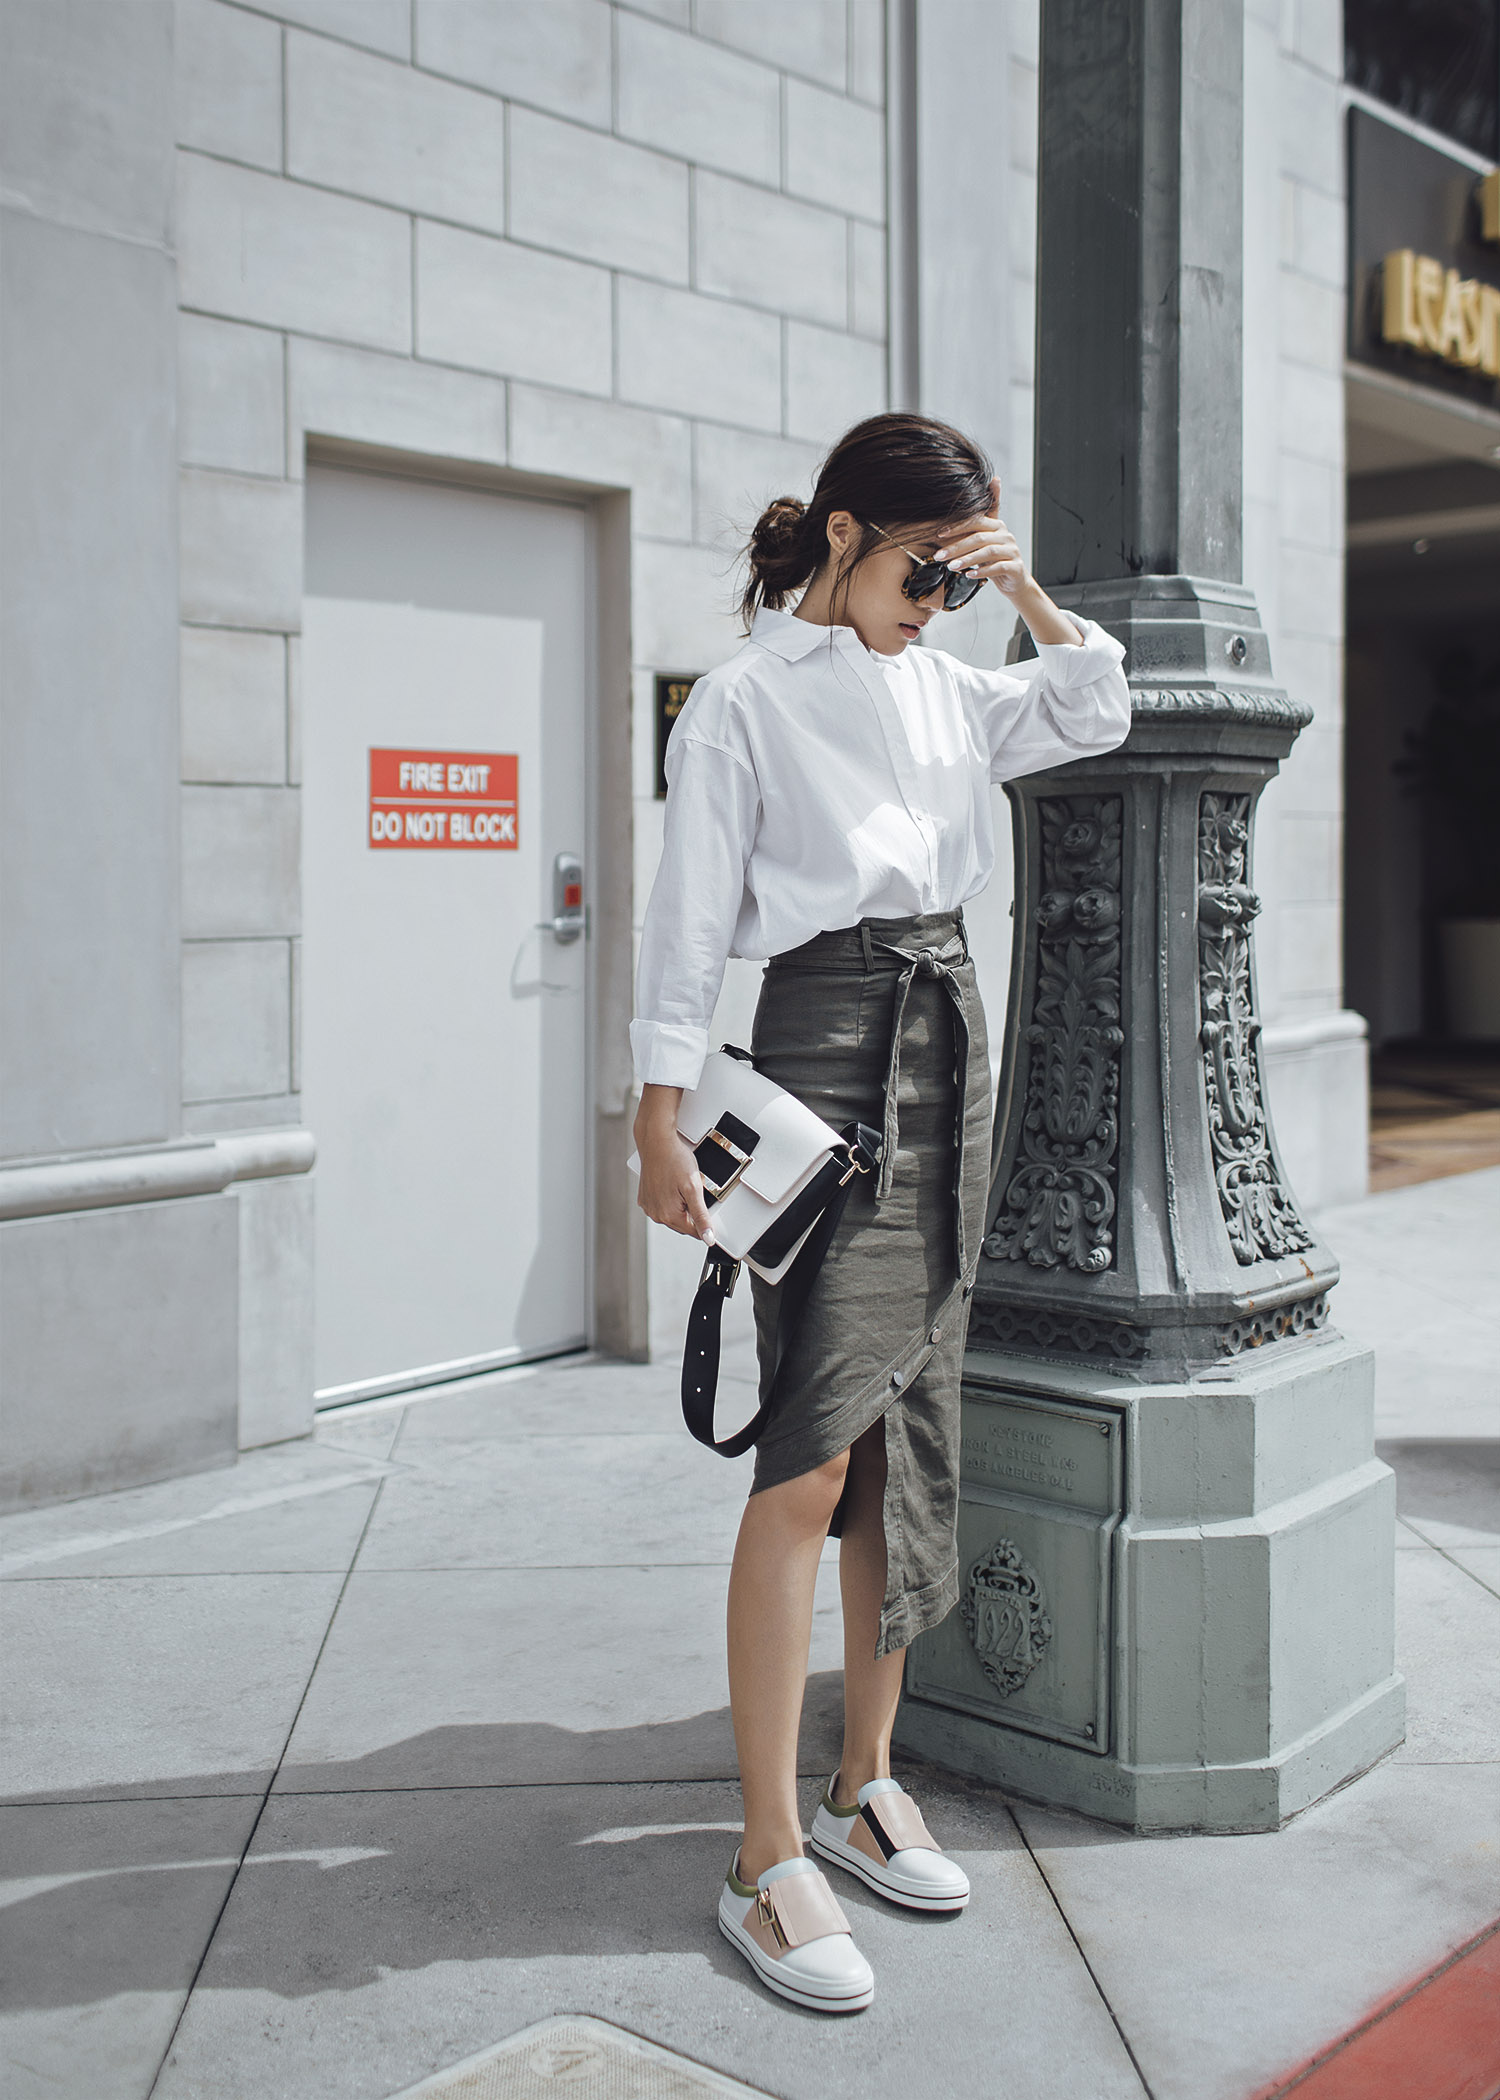 Midi skirt outfit Street style fashion blogger influencer Jenny Tsang of Tsangtastic wearing white button down shirt khaki high waist uneven hem midi skirt roger vivier sneaky viv sneakers karen walker sunglasses in Los Angeles California